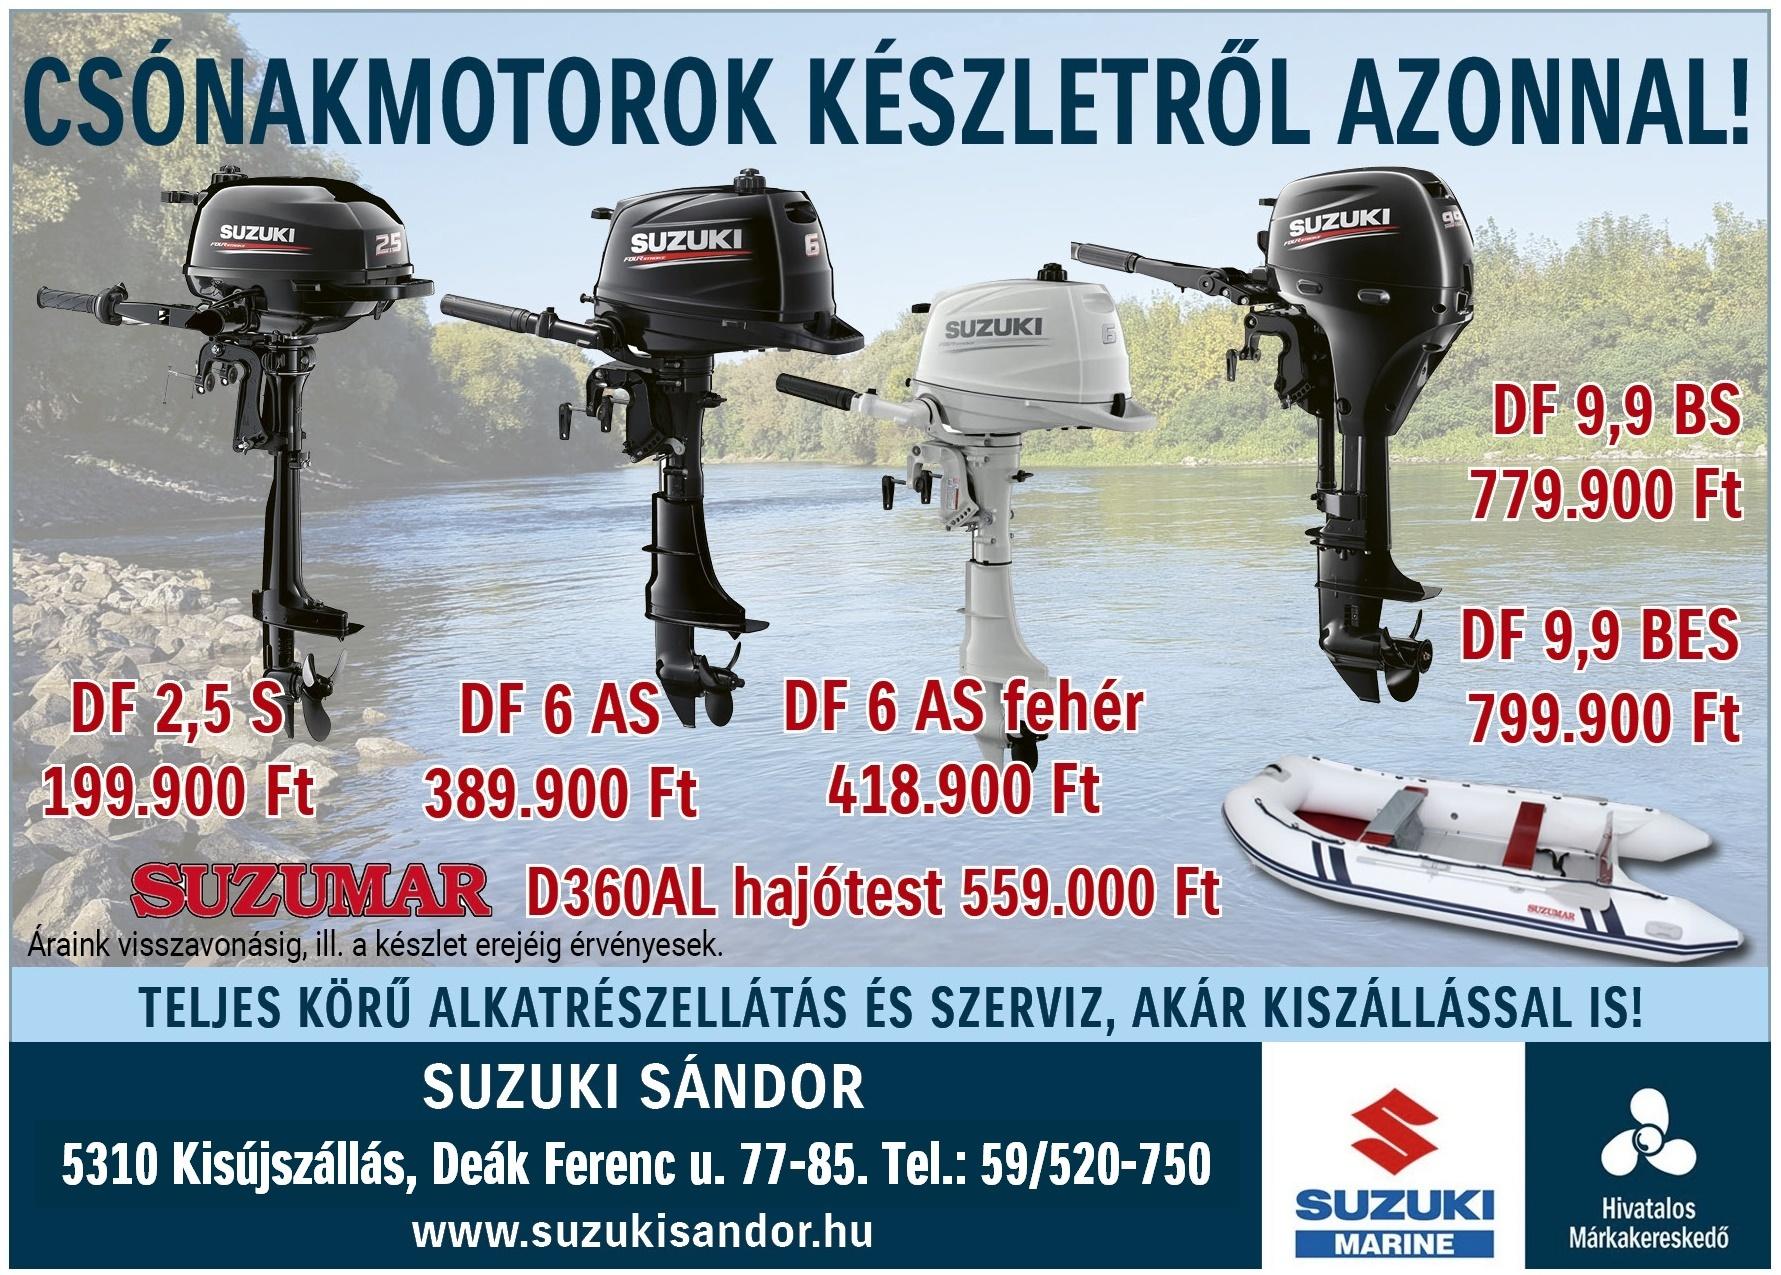 Suzuki csónakmotor